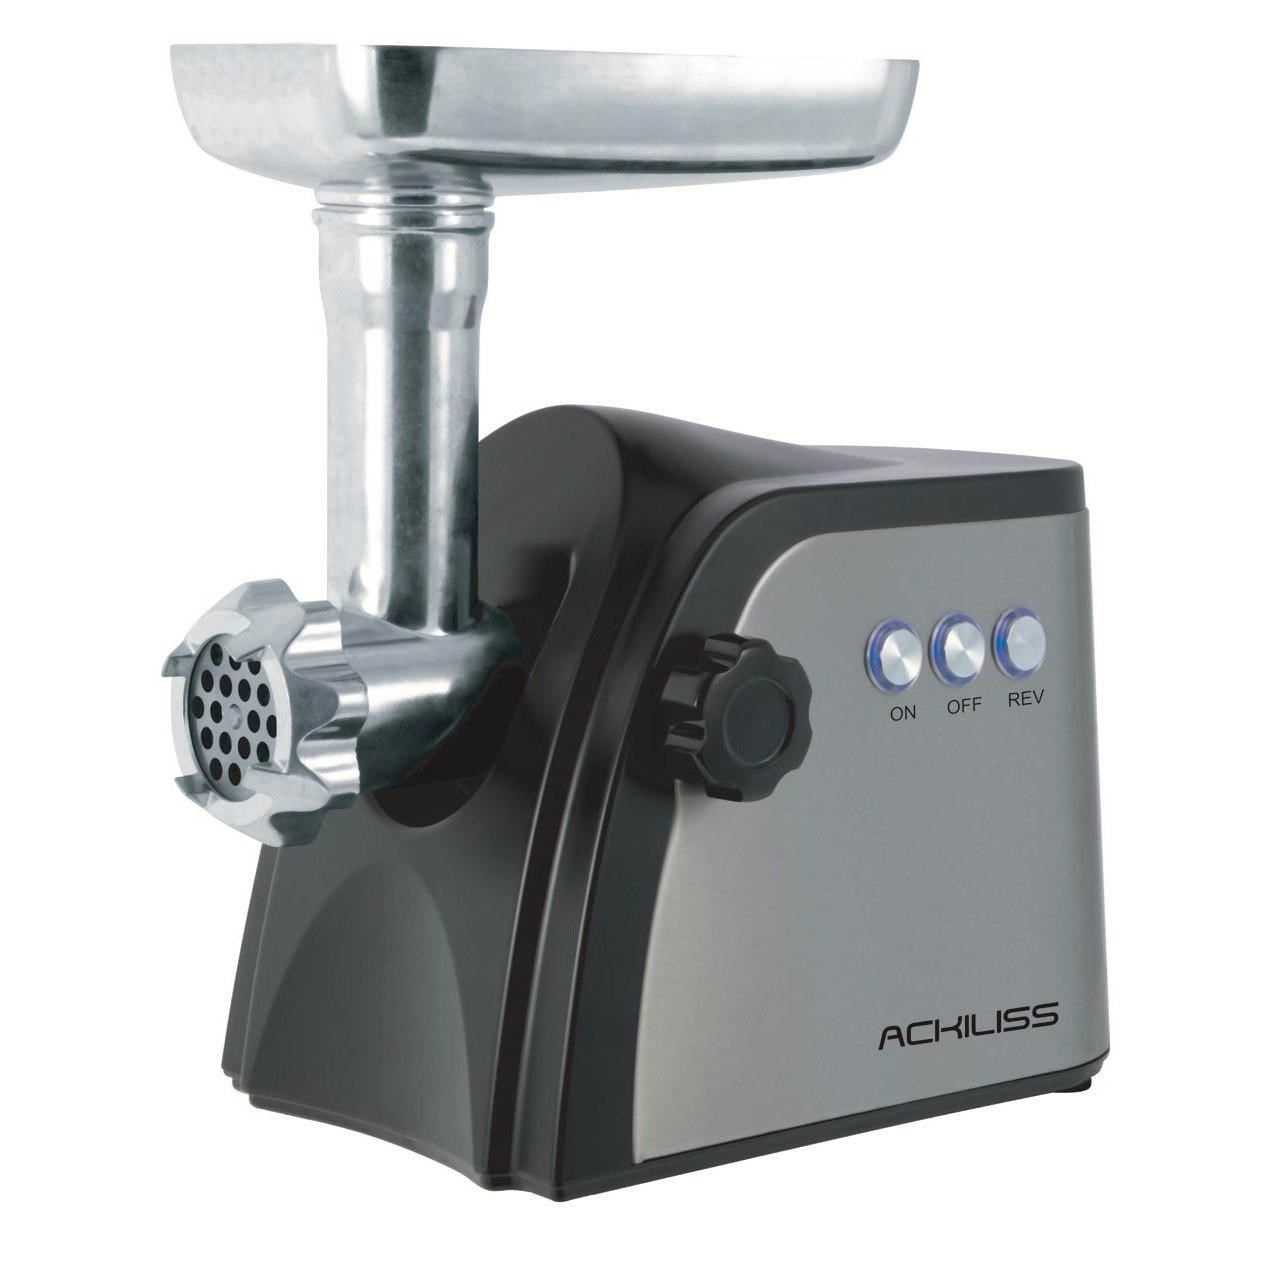 چرخ گوشت  آکیلیس مدلMG-2320